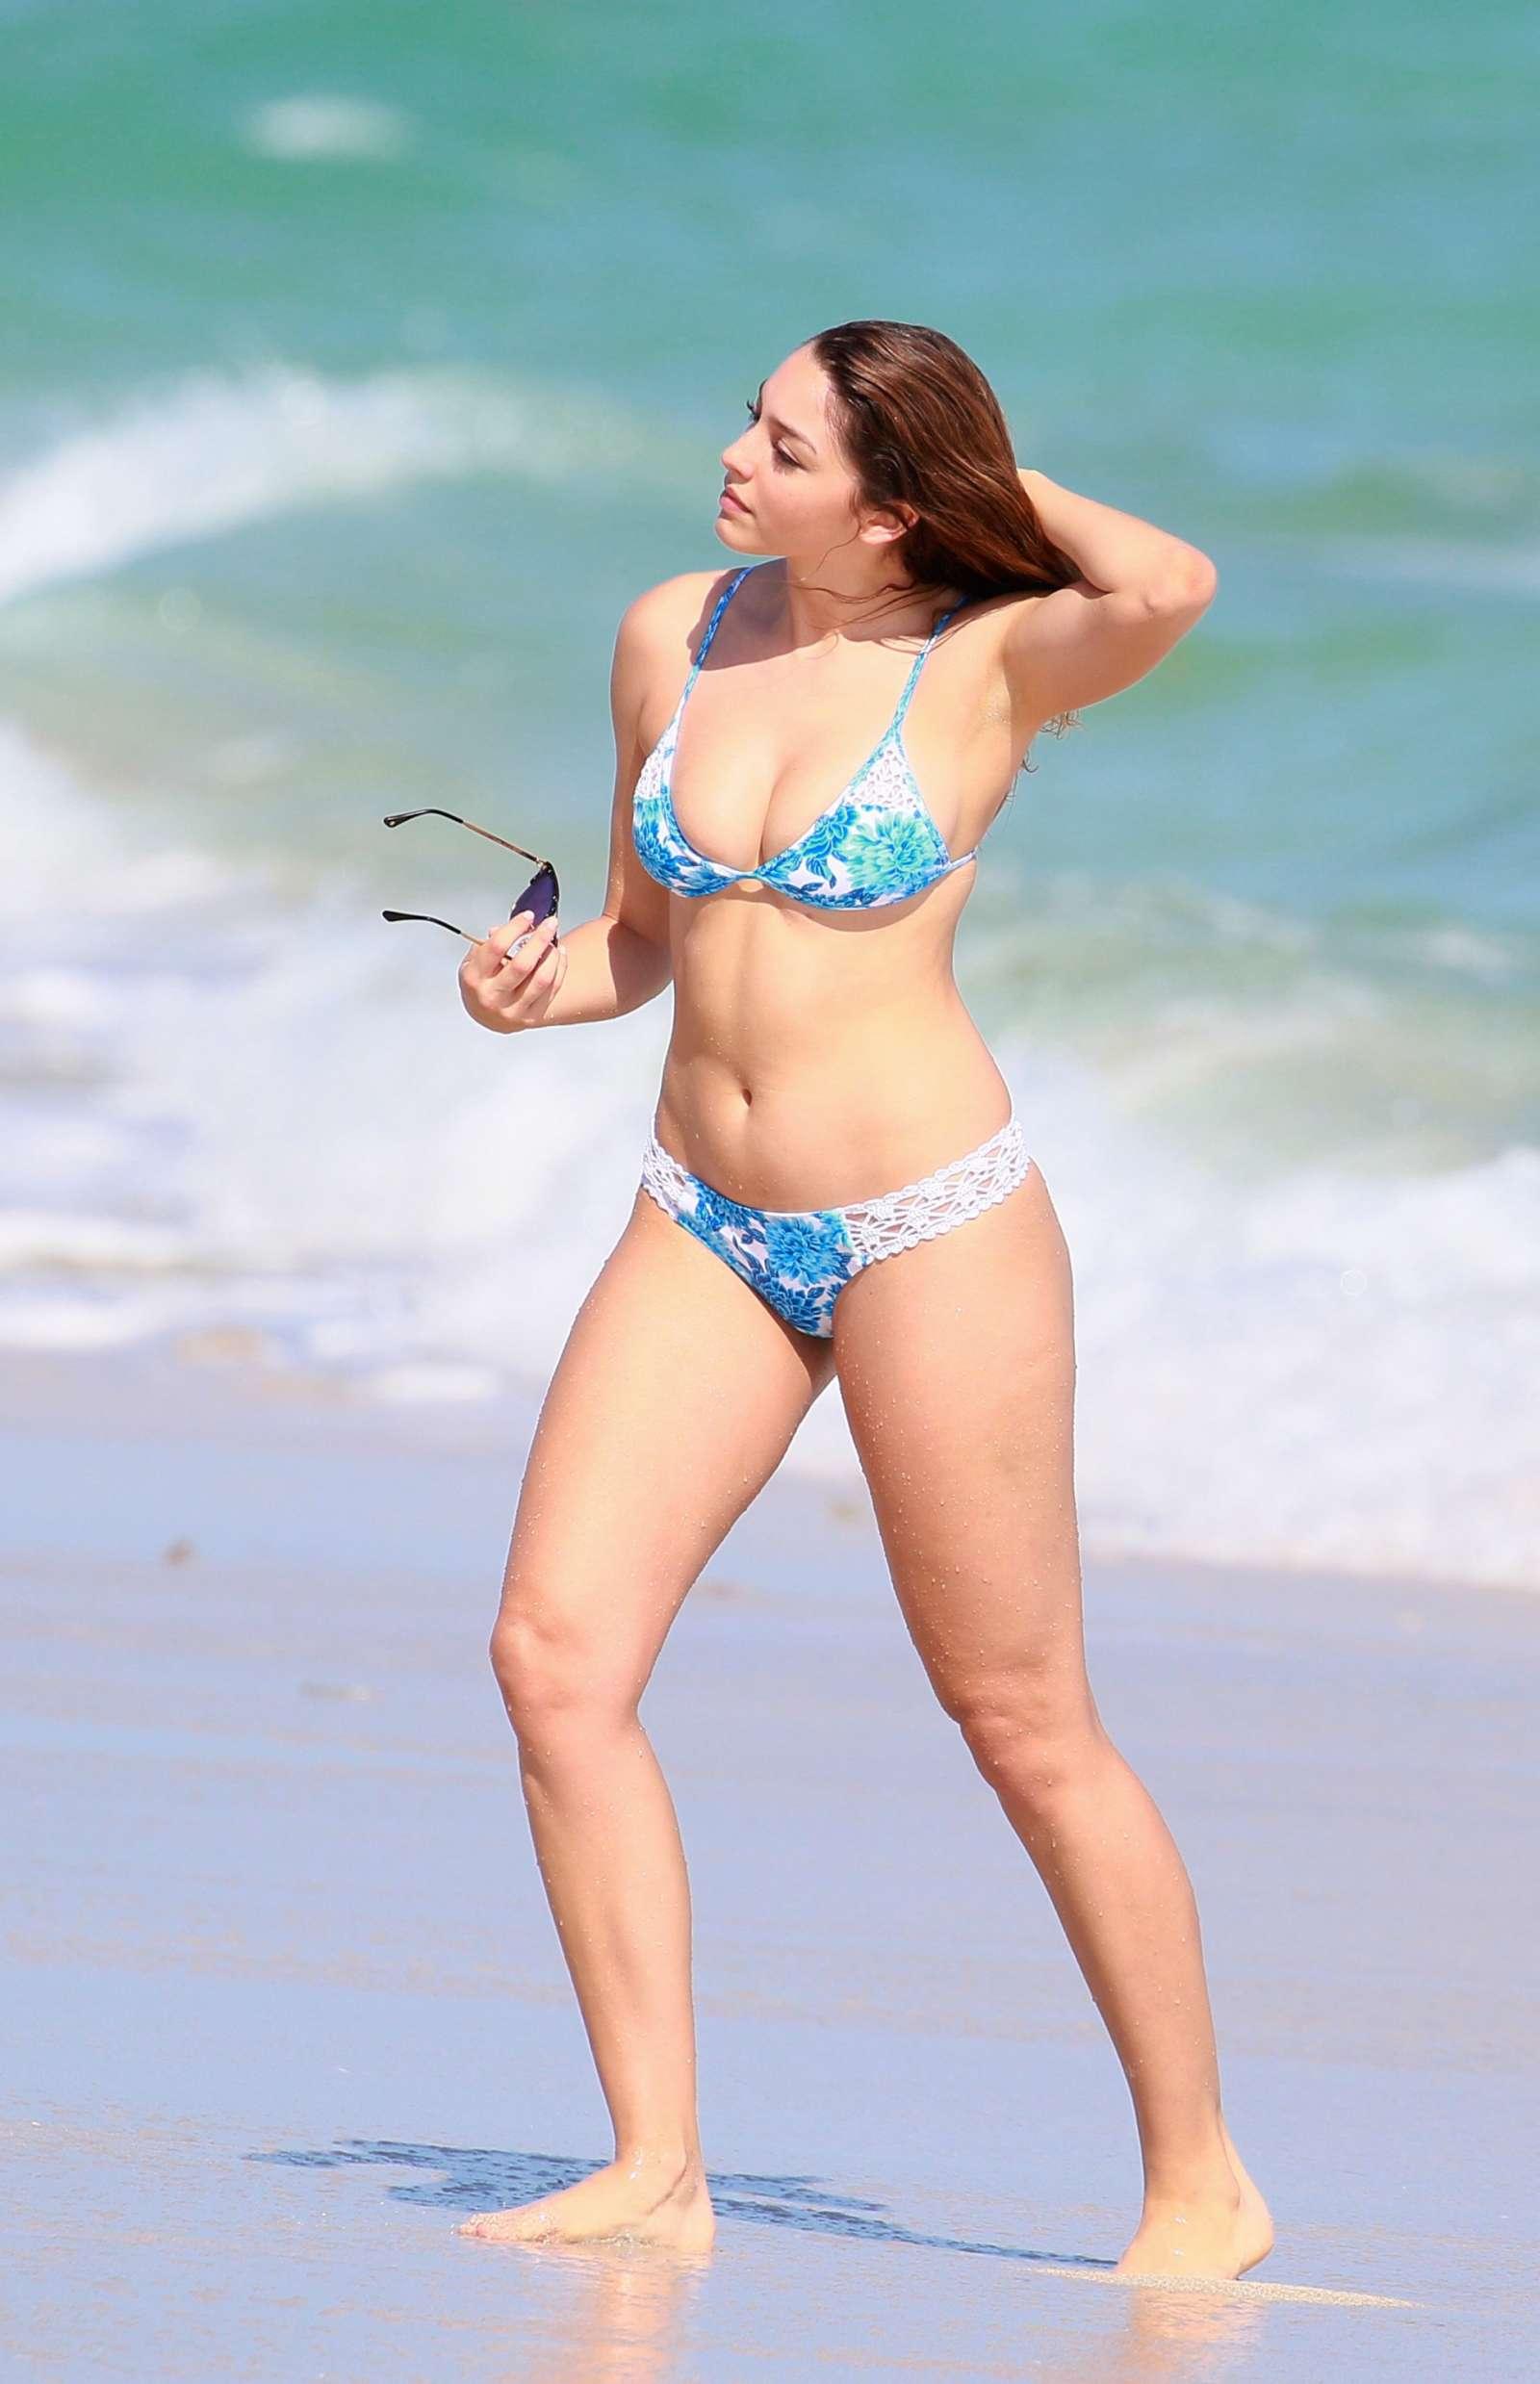 Celine Farach in Blue and White Bikini on Miami Beach